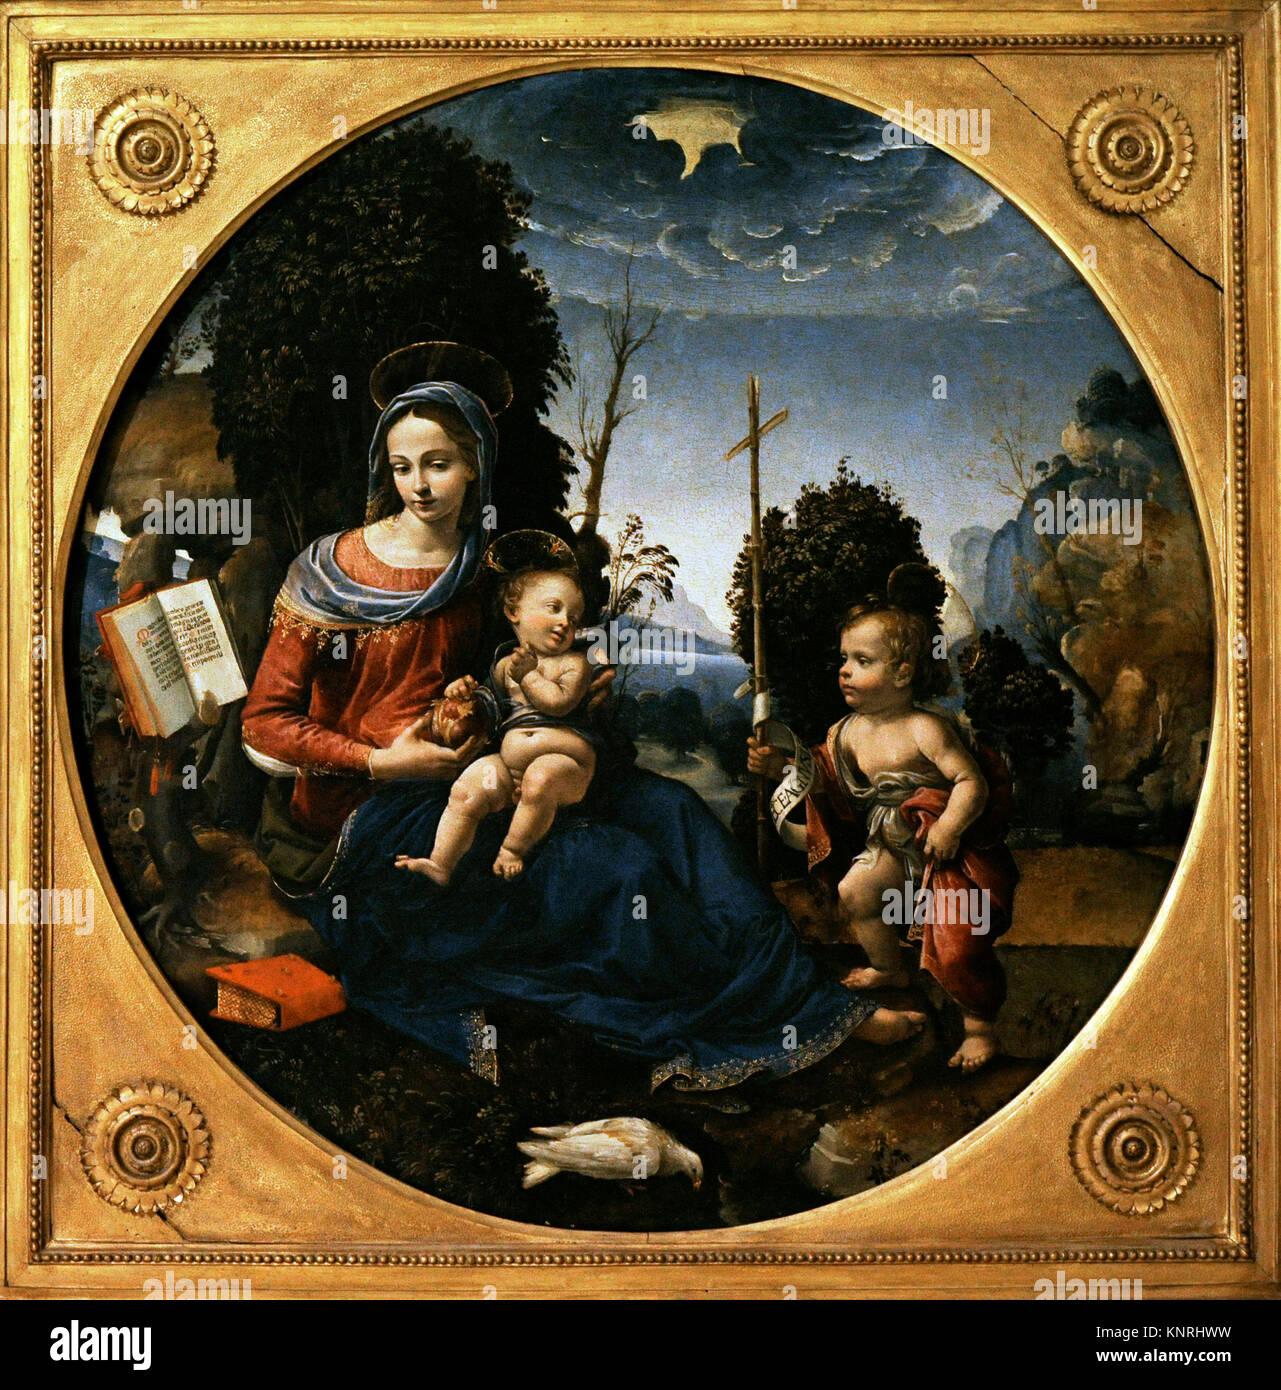 Raffaelino del Garbo (1466-1524). Italian painter. Virgin with Child and Saint John infant. Ca.1500. Bourbon Collection. - Stock Image